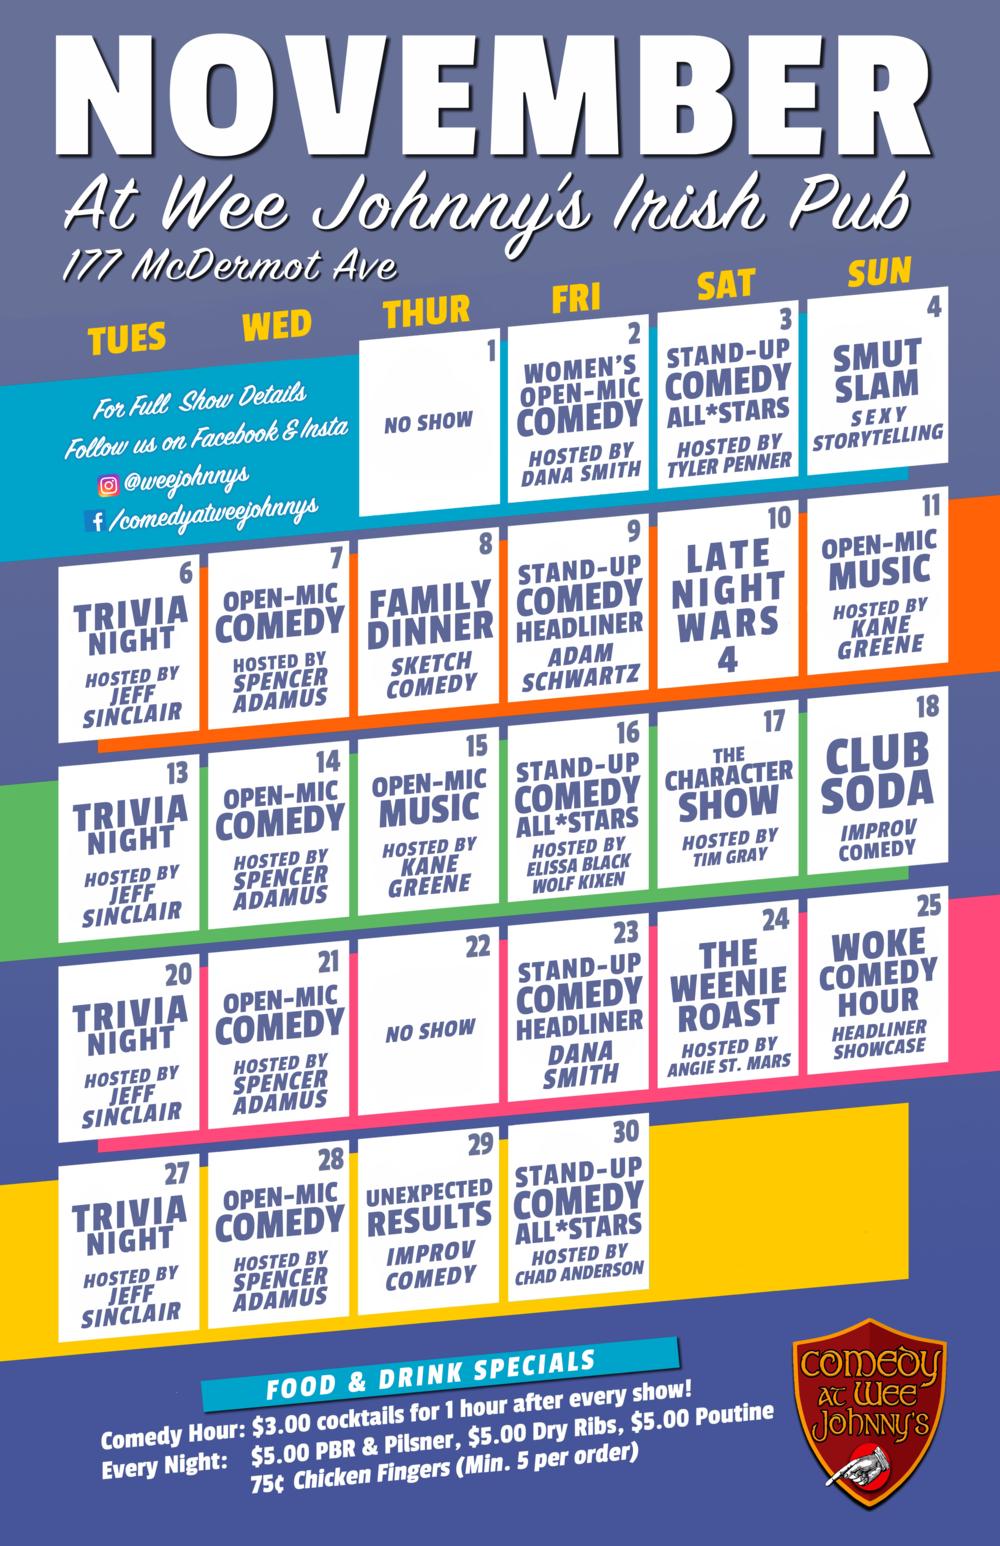 NOV 2018 calendar.png